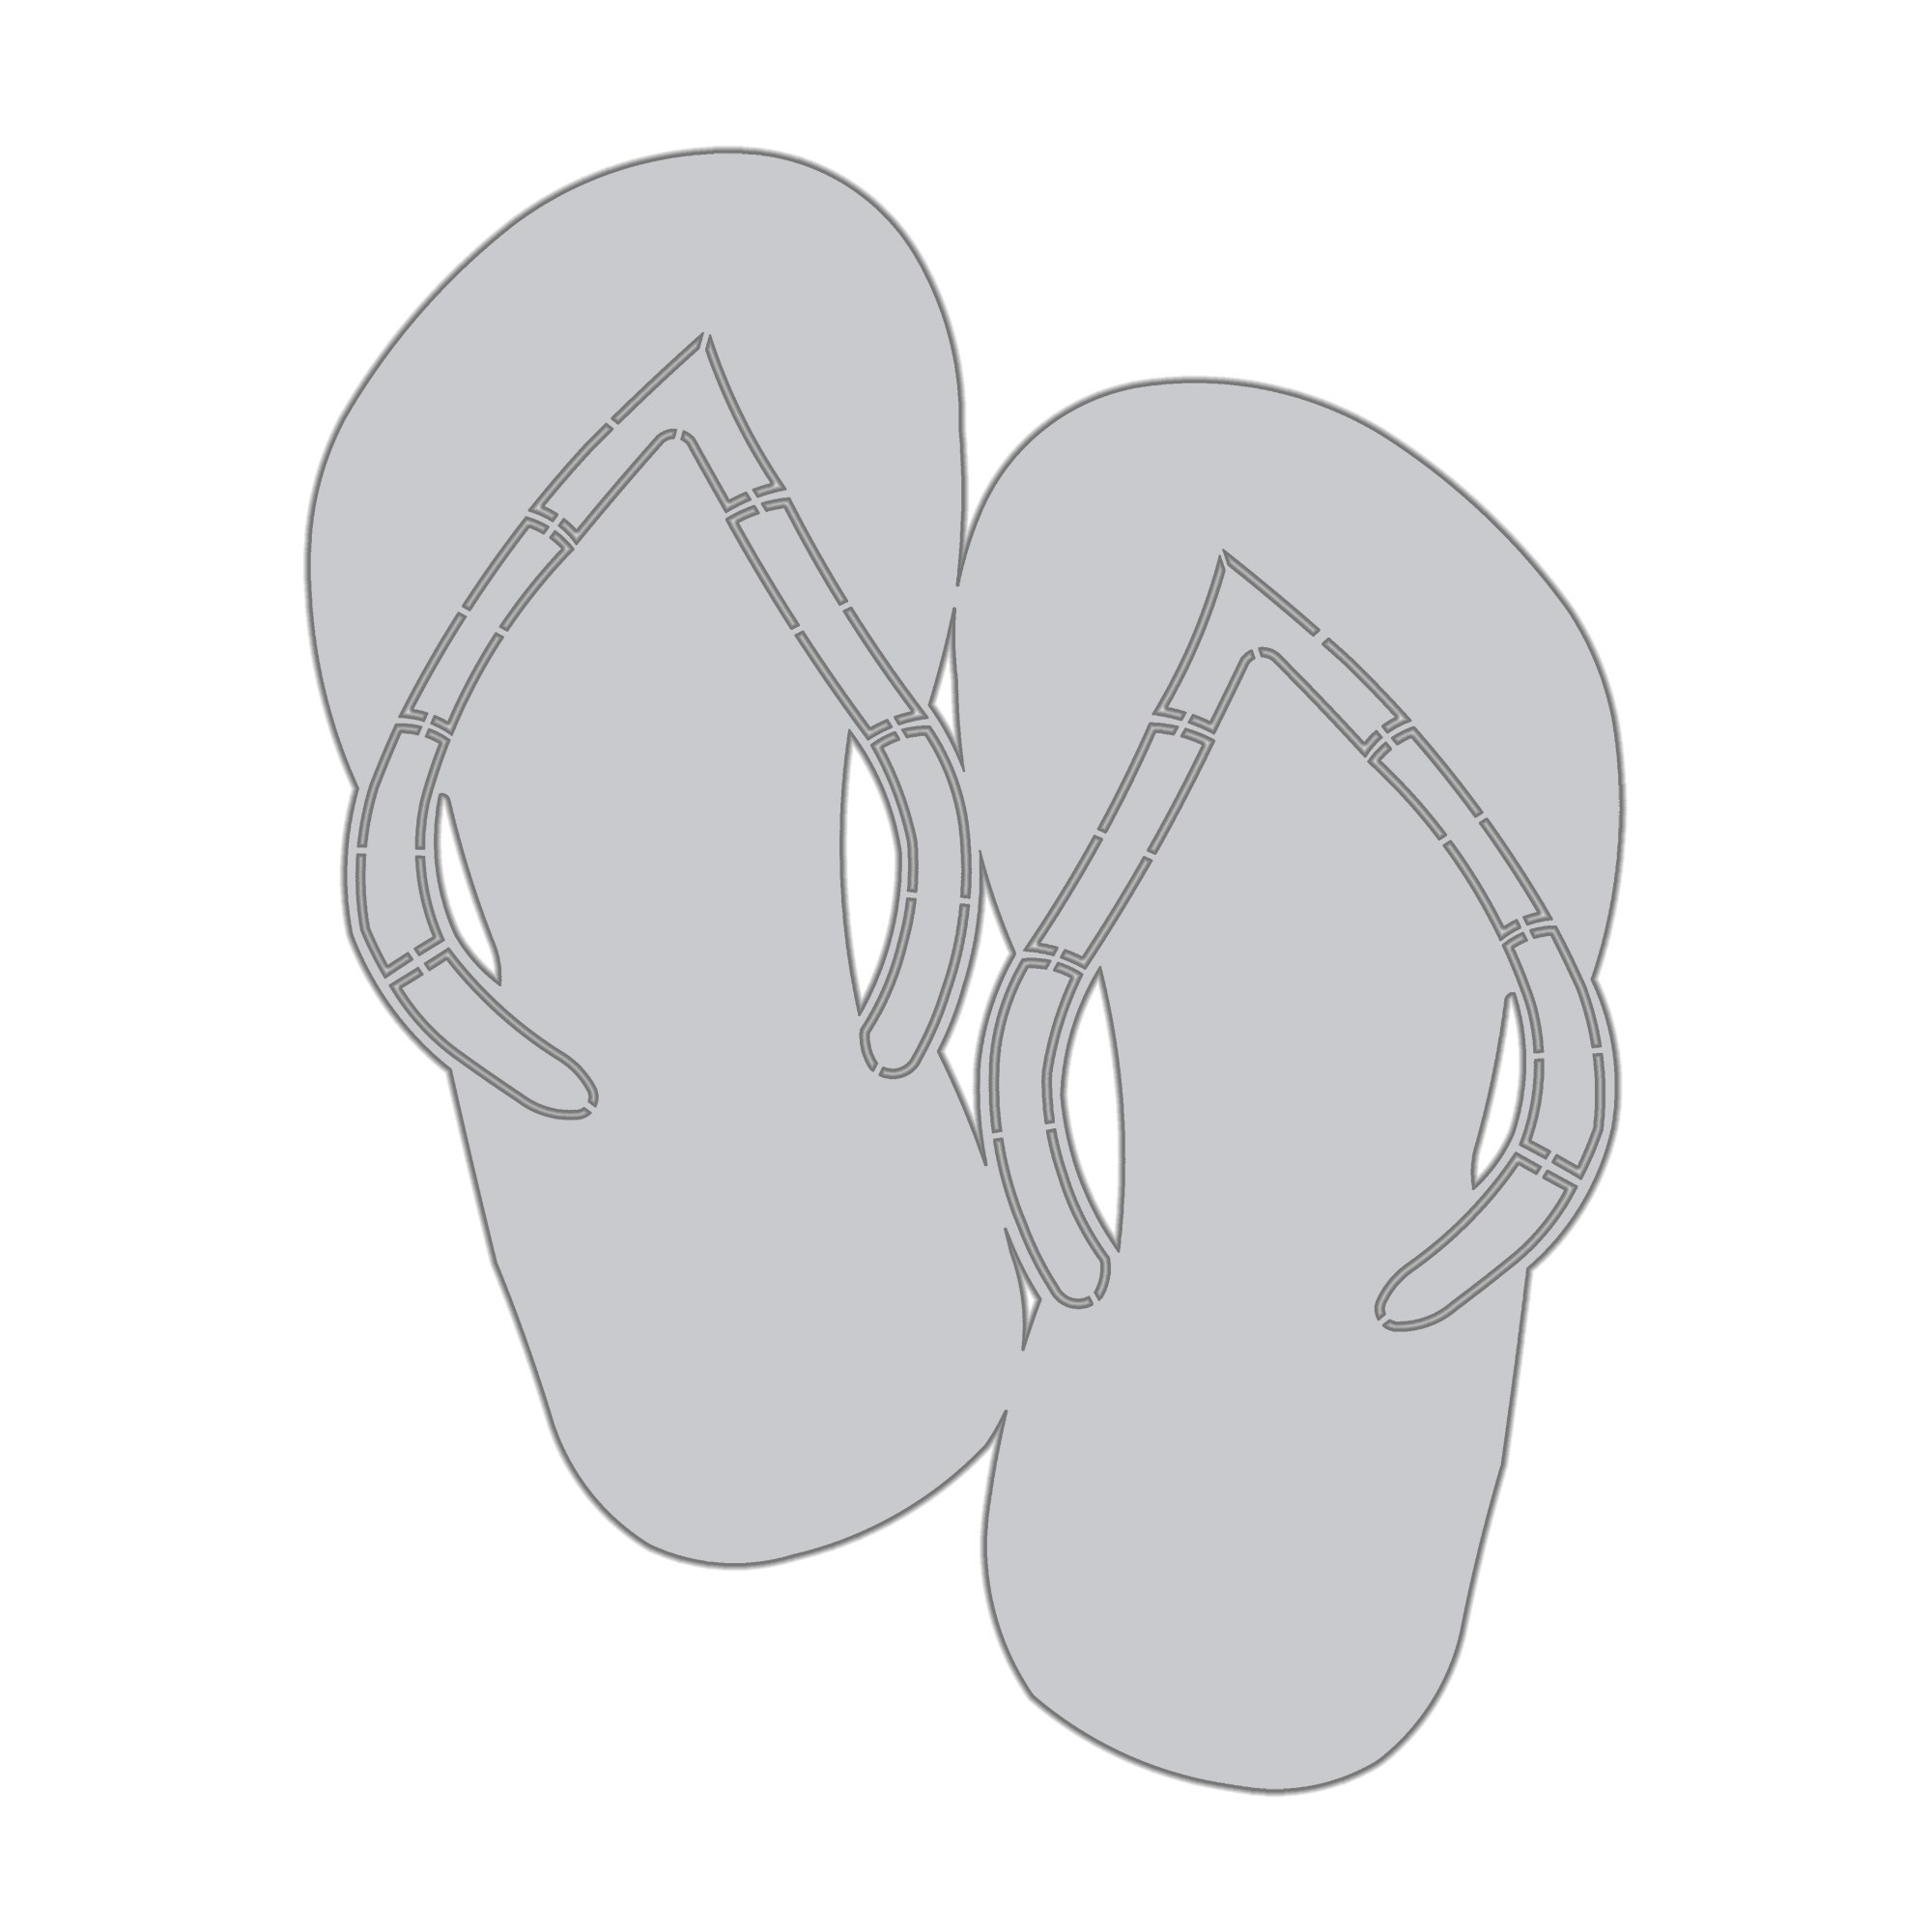 Blank flip flop clipart vector freeuse download Wall Art Flip Flop Blank vector freeuse download